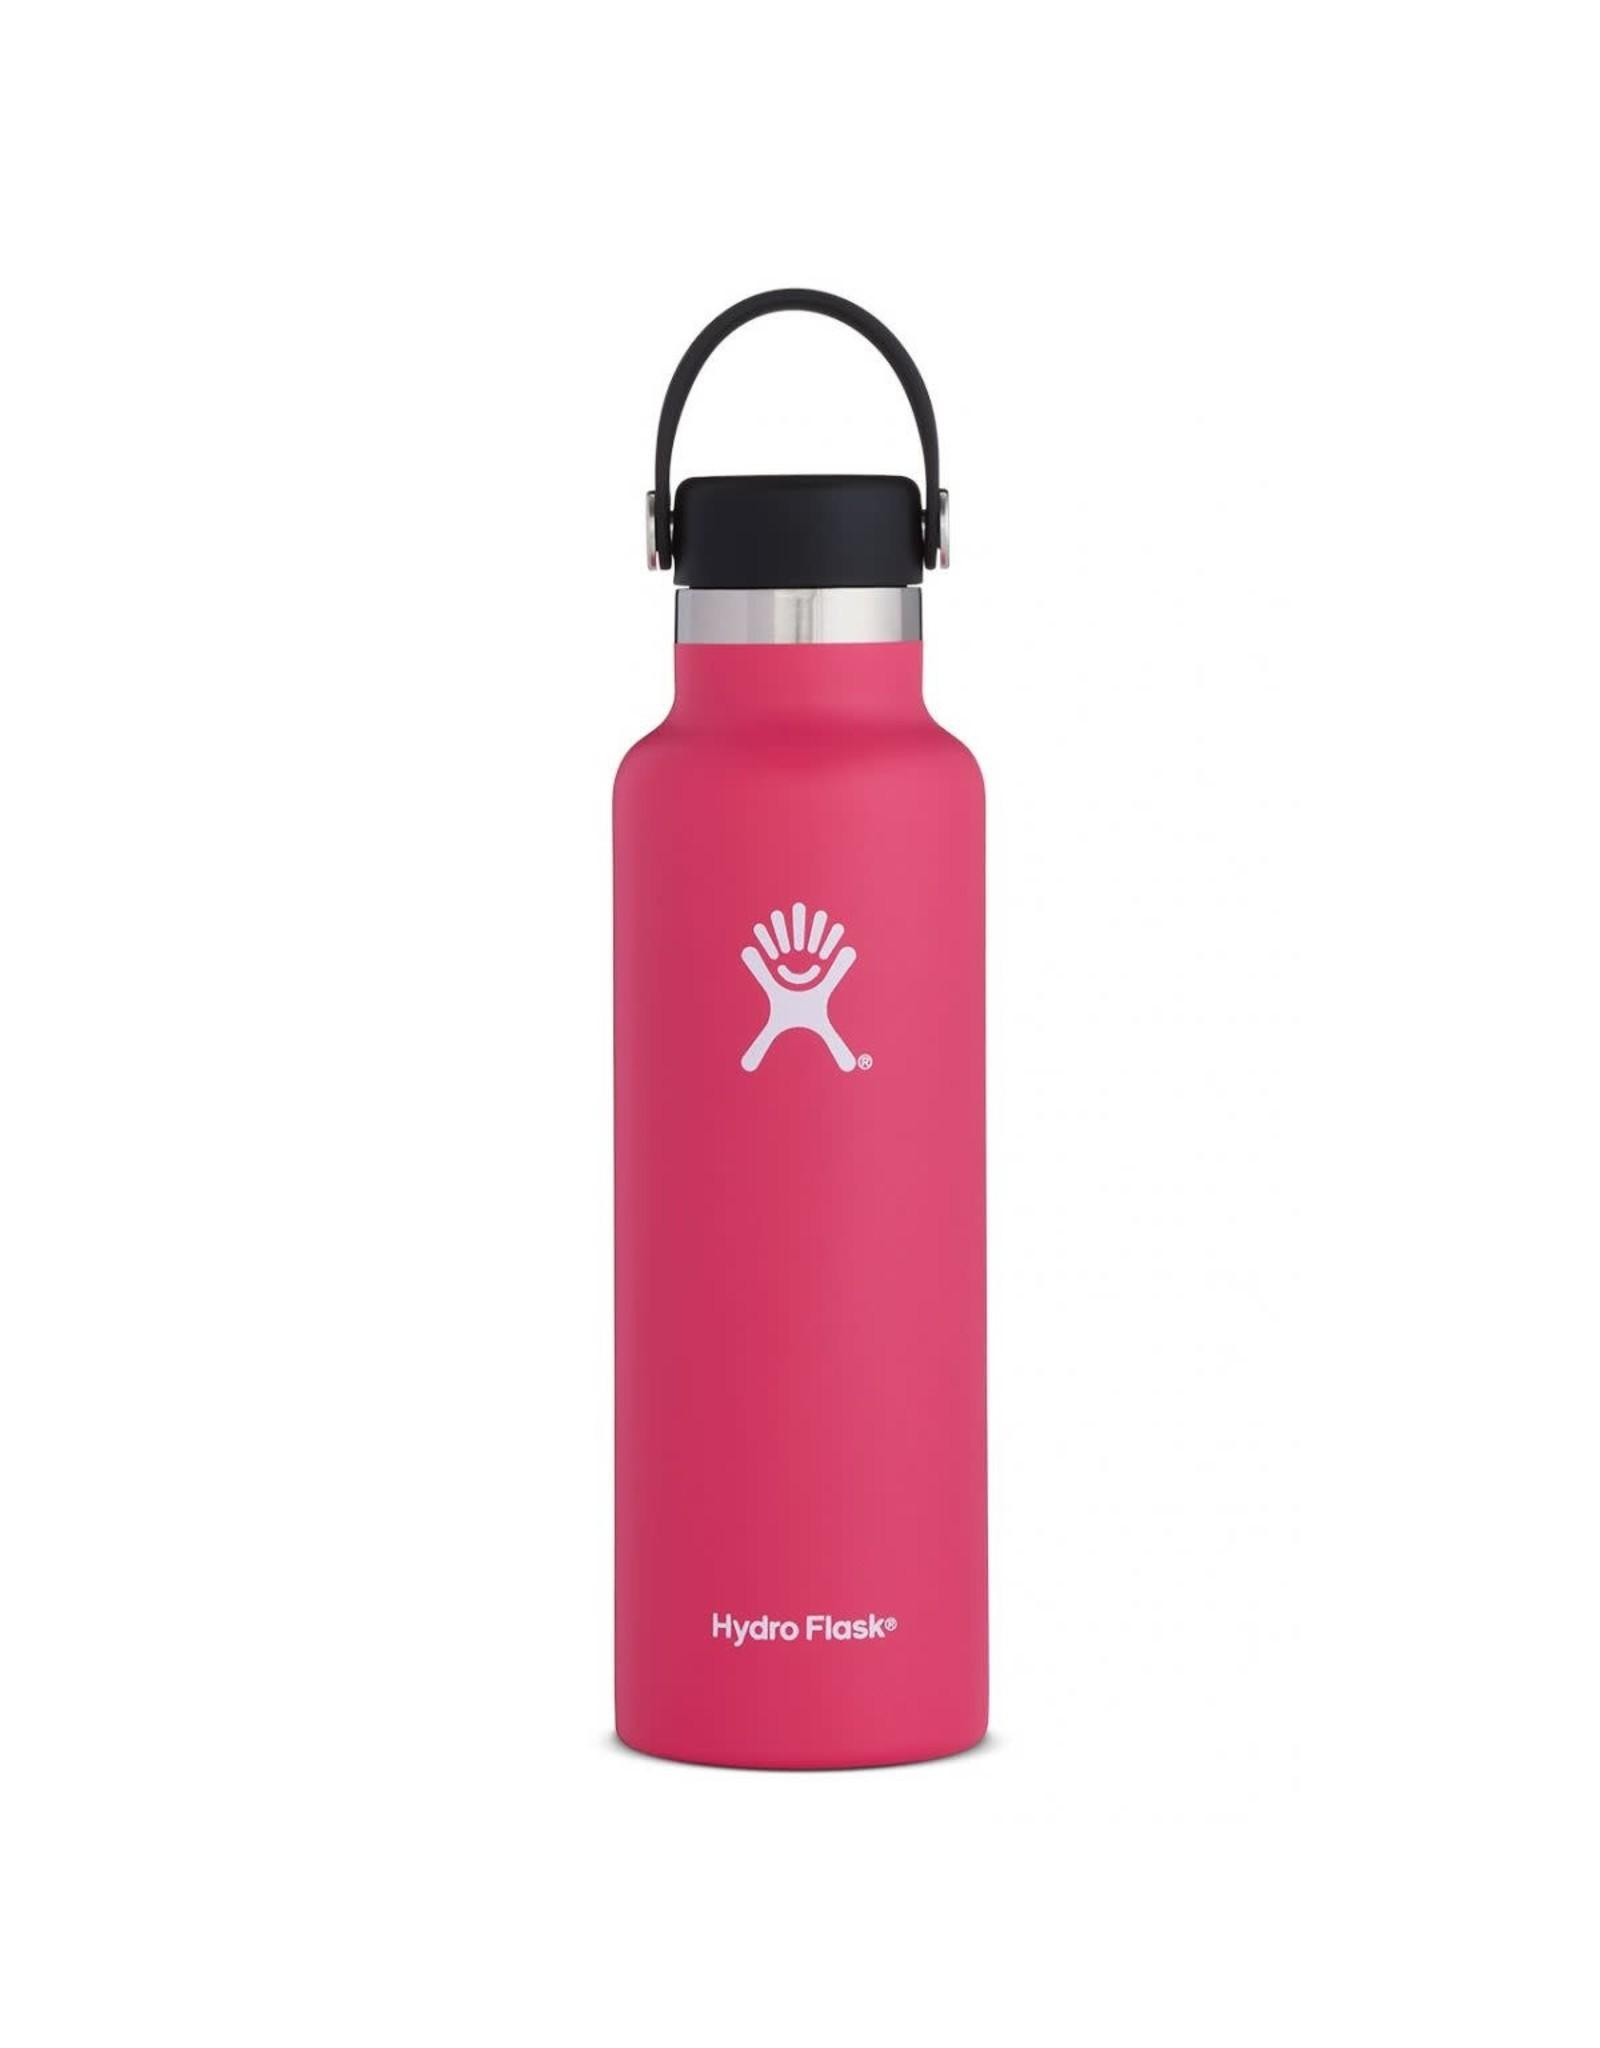 Hydro Flask Hydro Flask 21oz Standard Mouth Watermelon